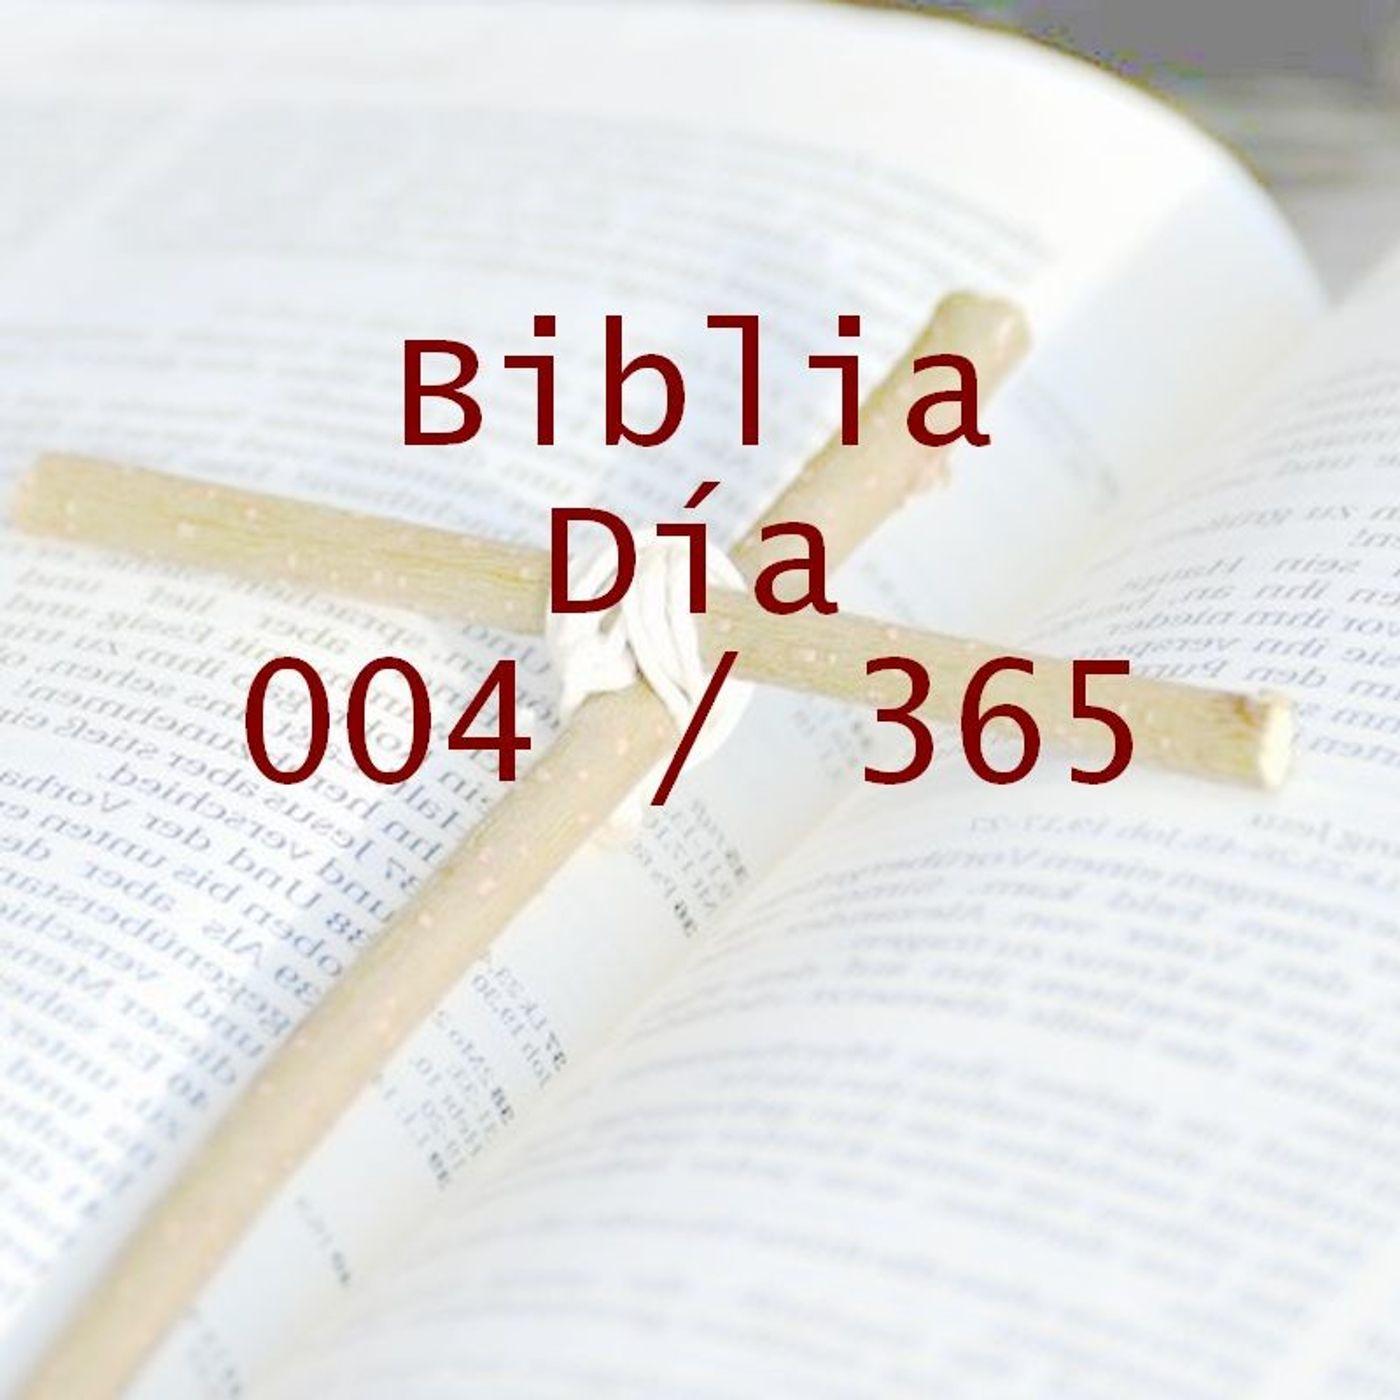 365 dias para la Biblia - Dia 004